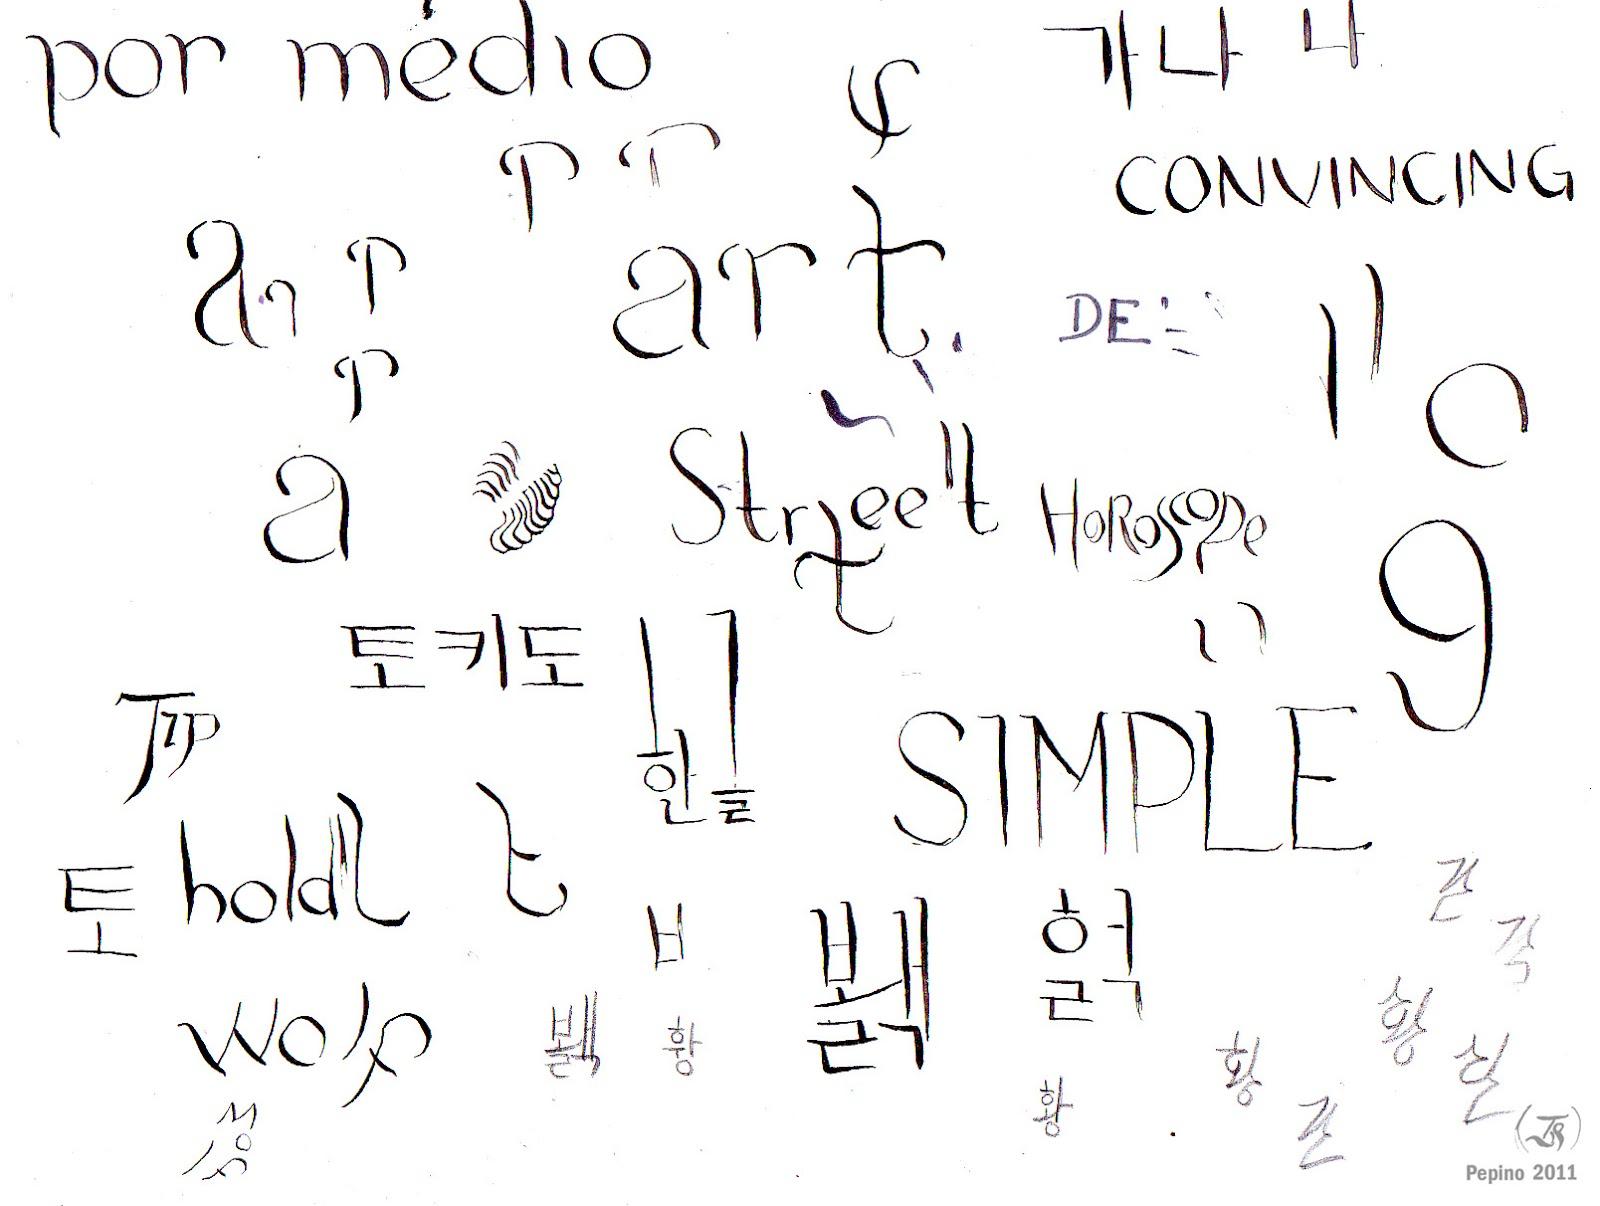 http://4.bp.blogspot.com/-ie0WFMPIhCk/TyxCedODNII/AAAAAAAAAEM/wiSrsAQxLvo/s1600/caligrafia+13.jpg